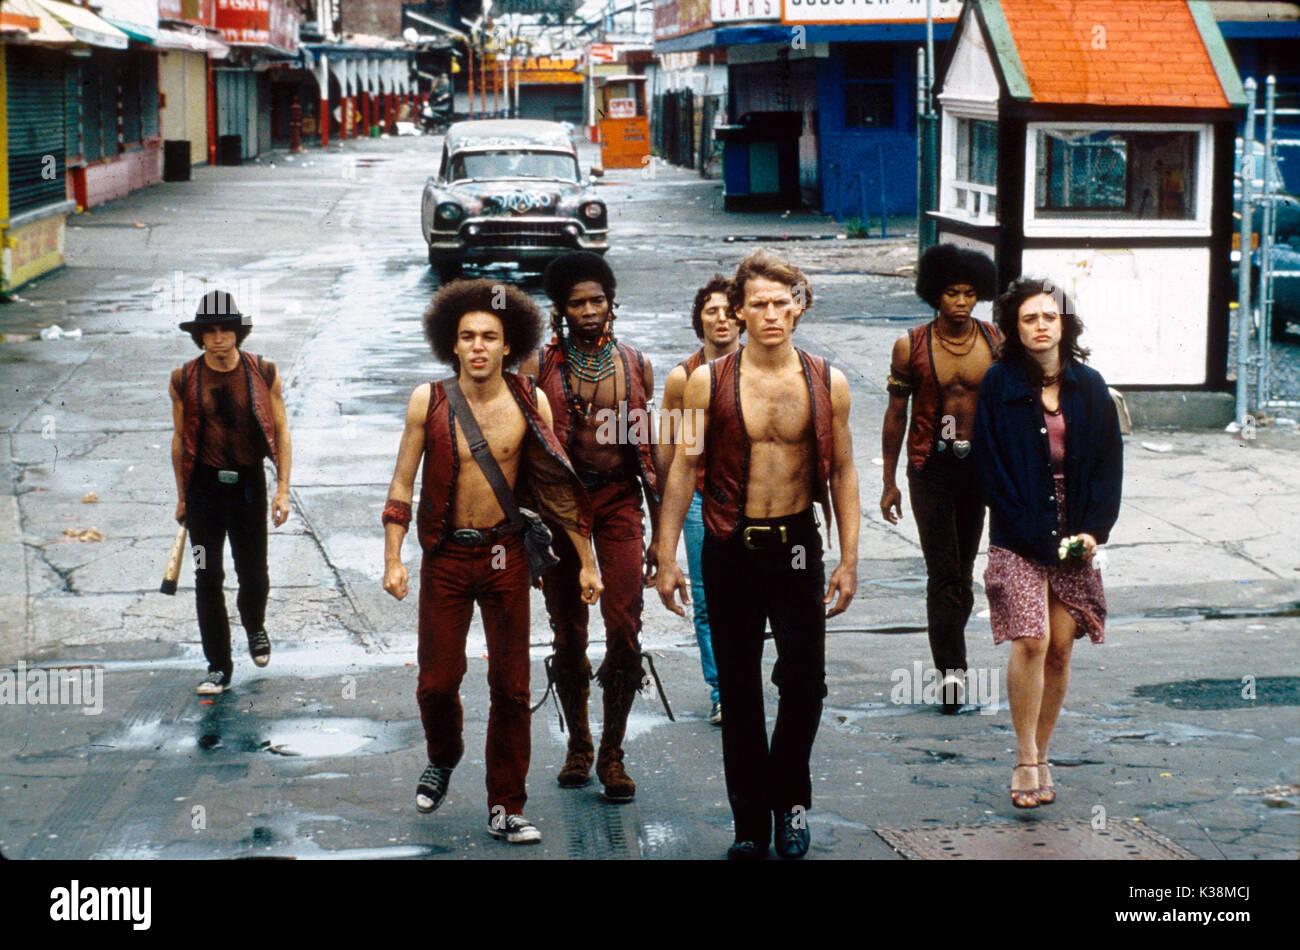 THE WARRIORS [?], [?], DAVID HARRIS, [?], MICHAEL BECK, BRIAN TYLER, DEBORAH VAN VALKENBURGH - Stock Image